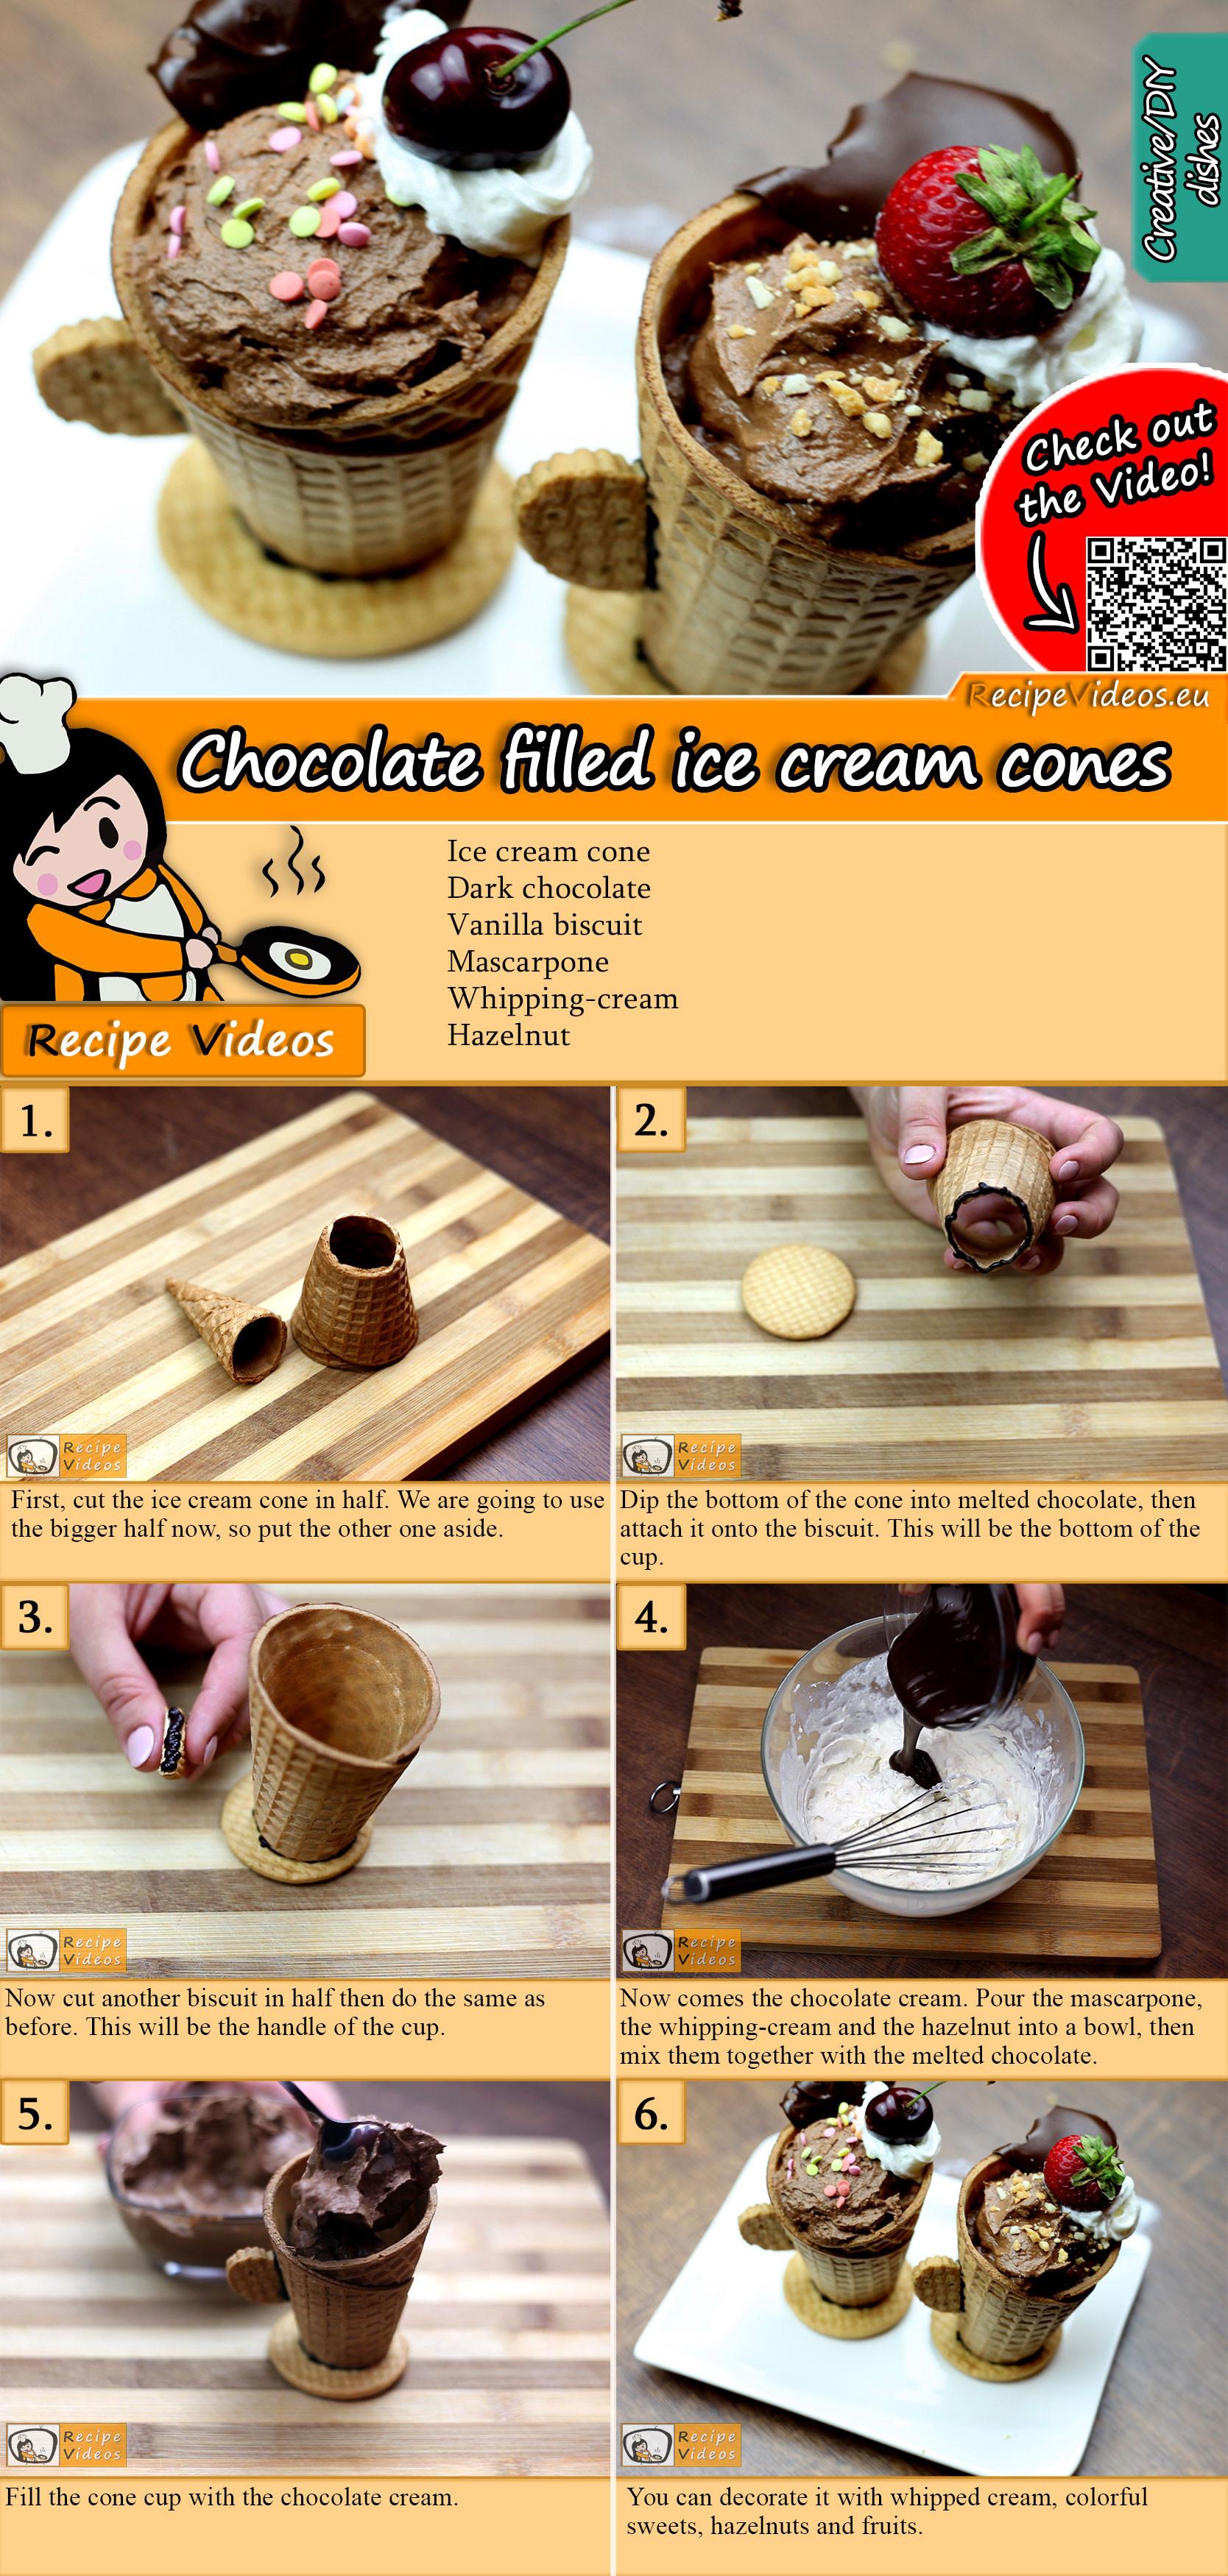 Chocolate filled ice cream cones recipe with video